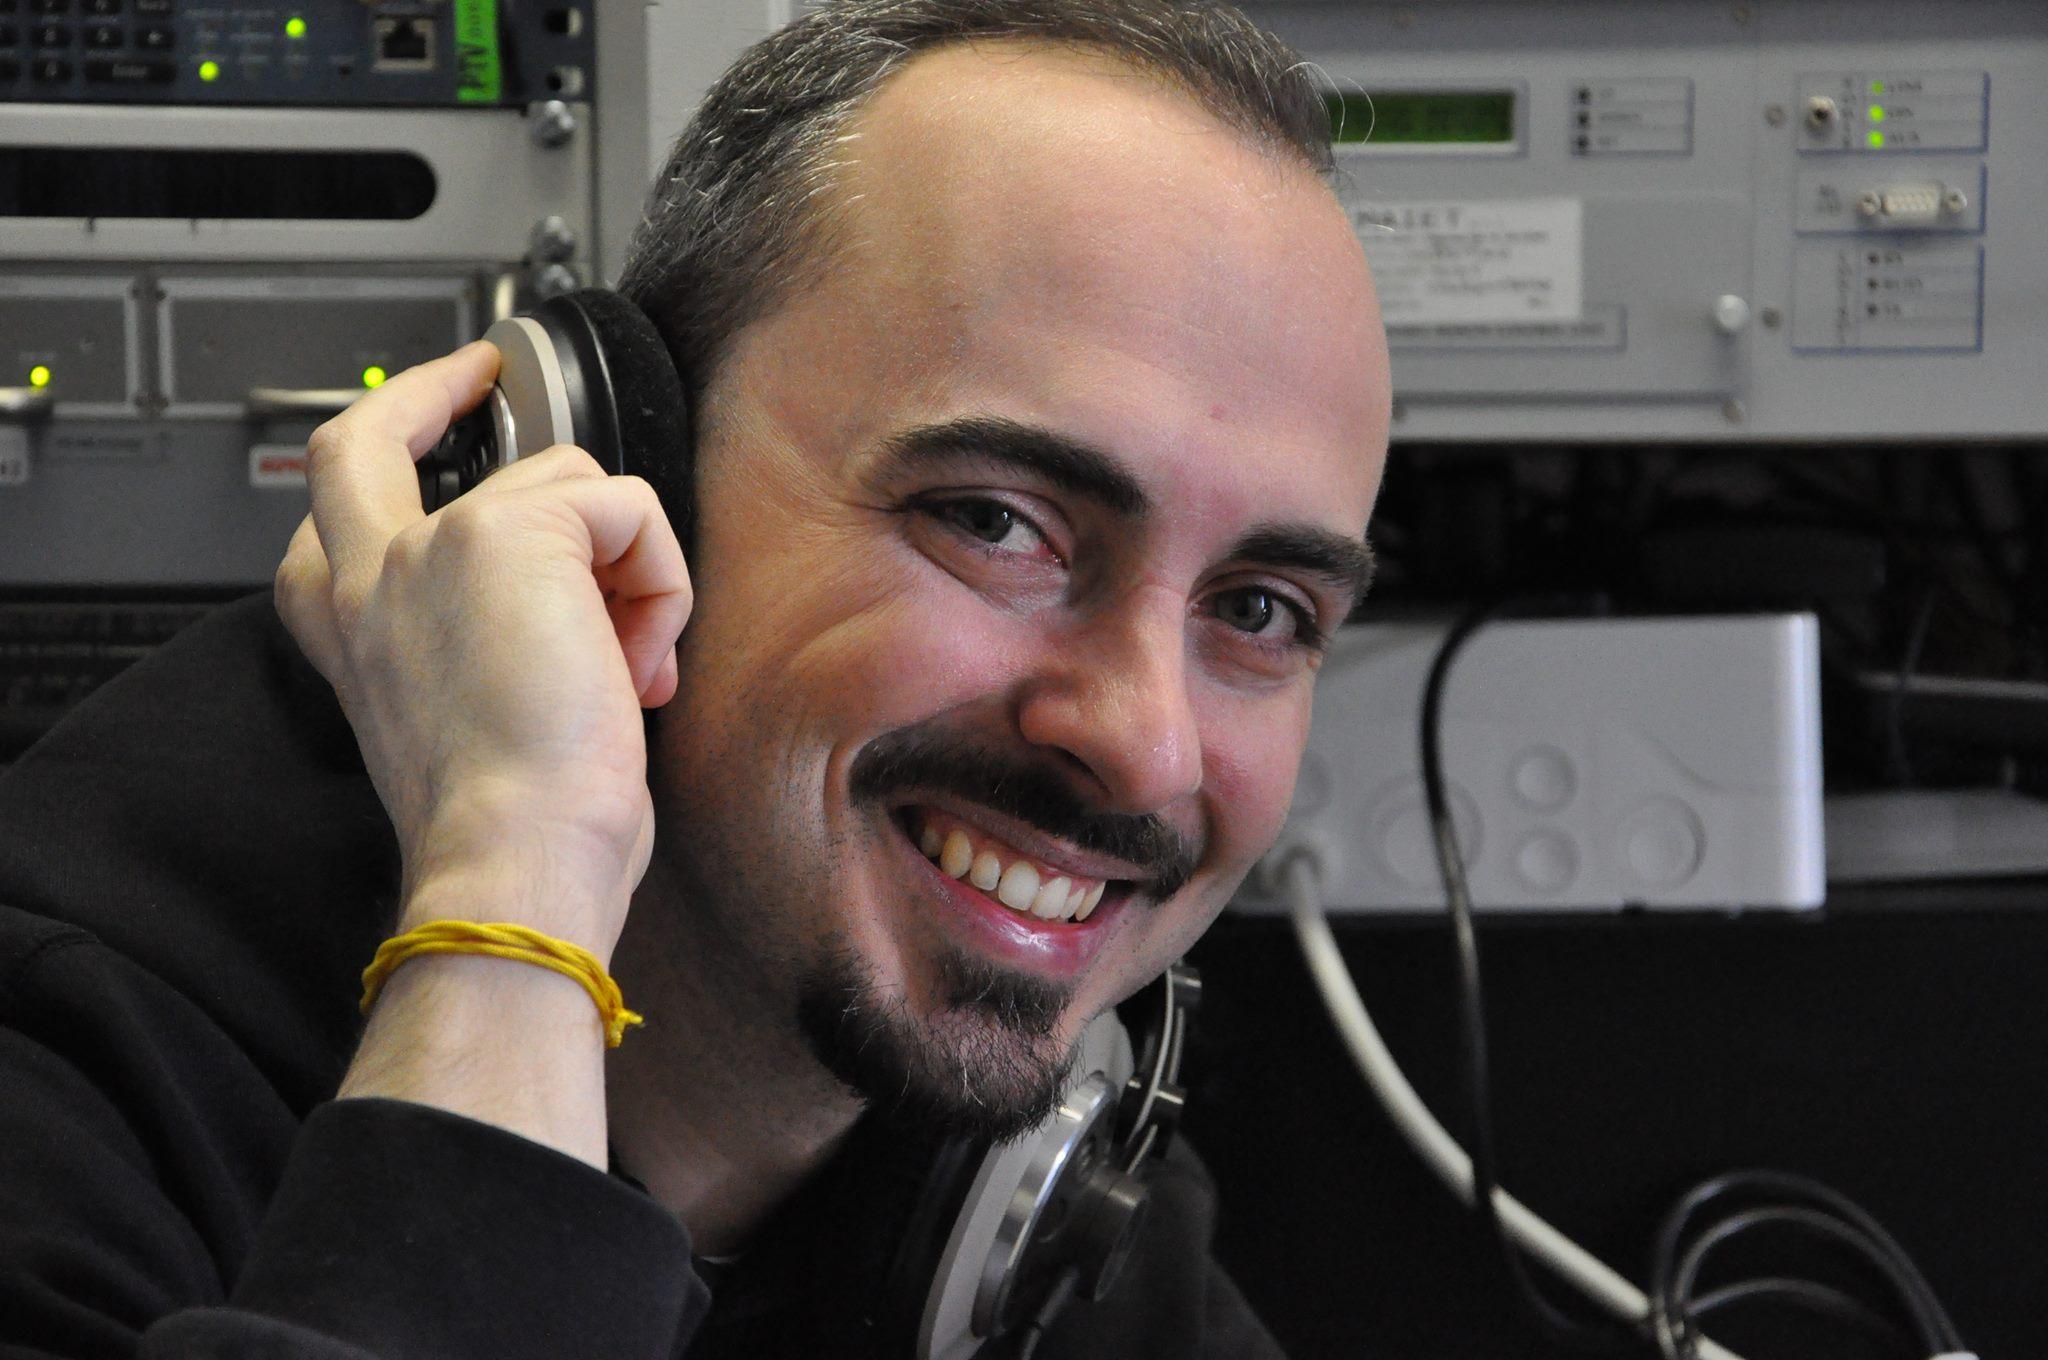 Alessandro Stefanoni